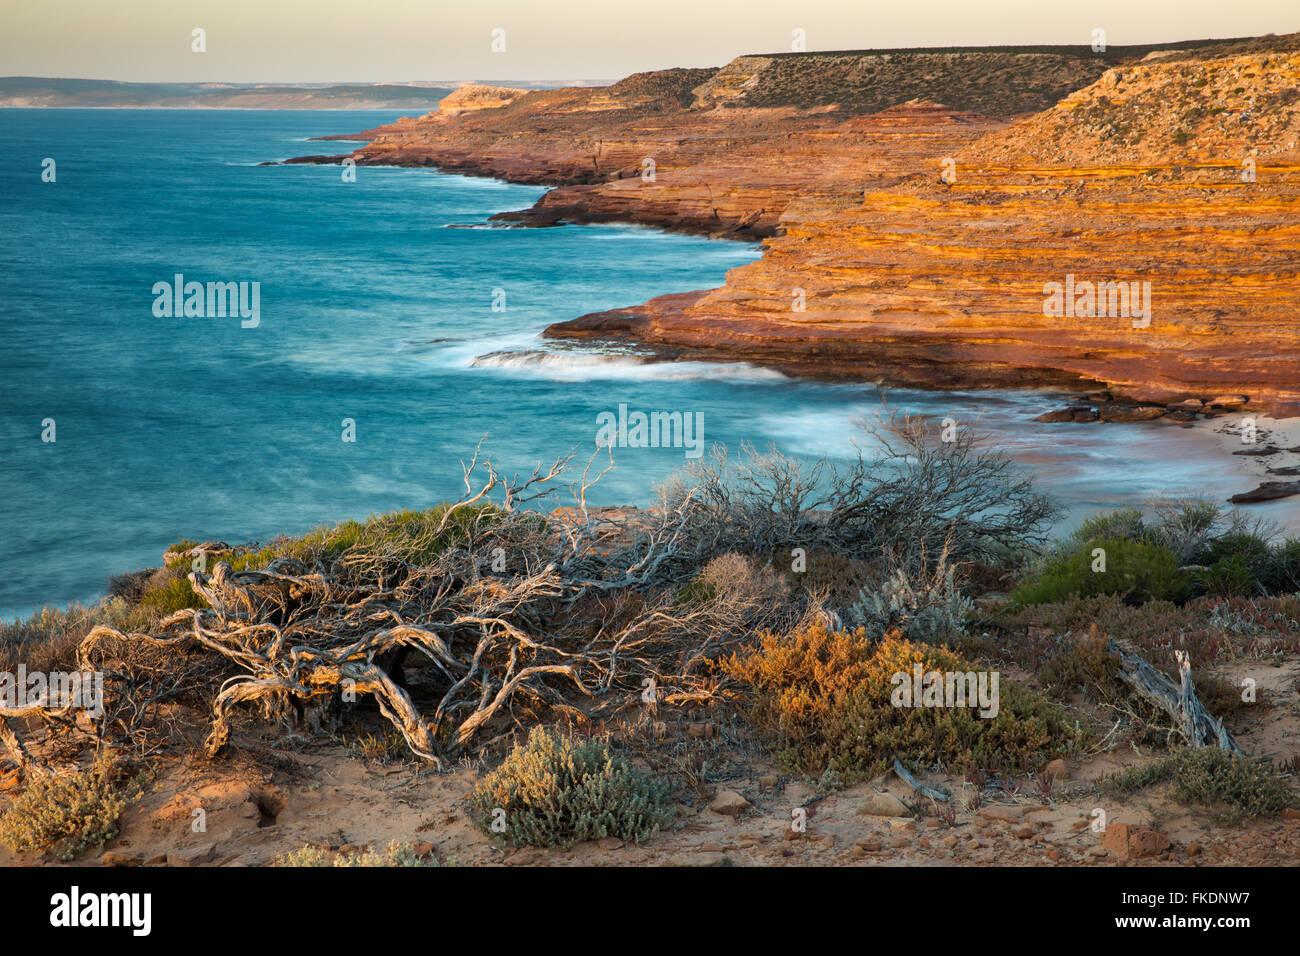 Gantheaume Bay da l'Aquila lookout, Kalbarri National Park, Australia occidentale Immagini Stock